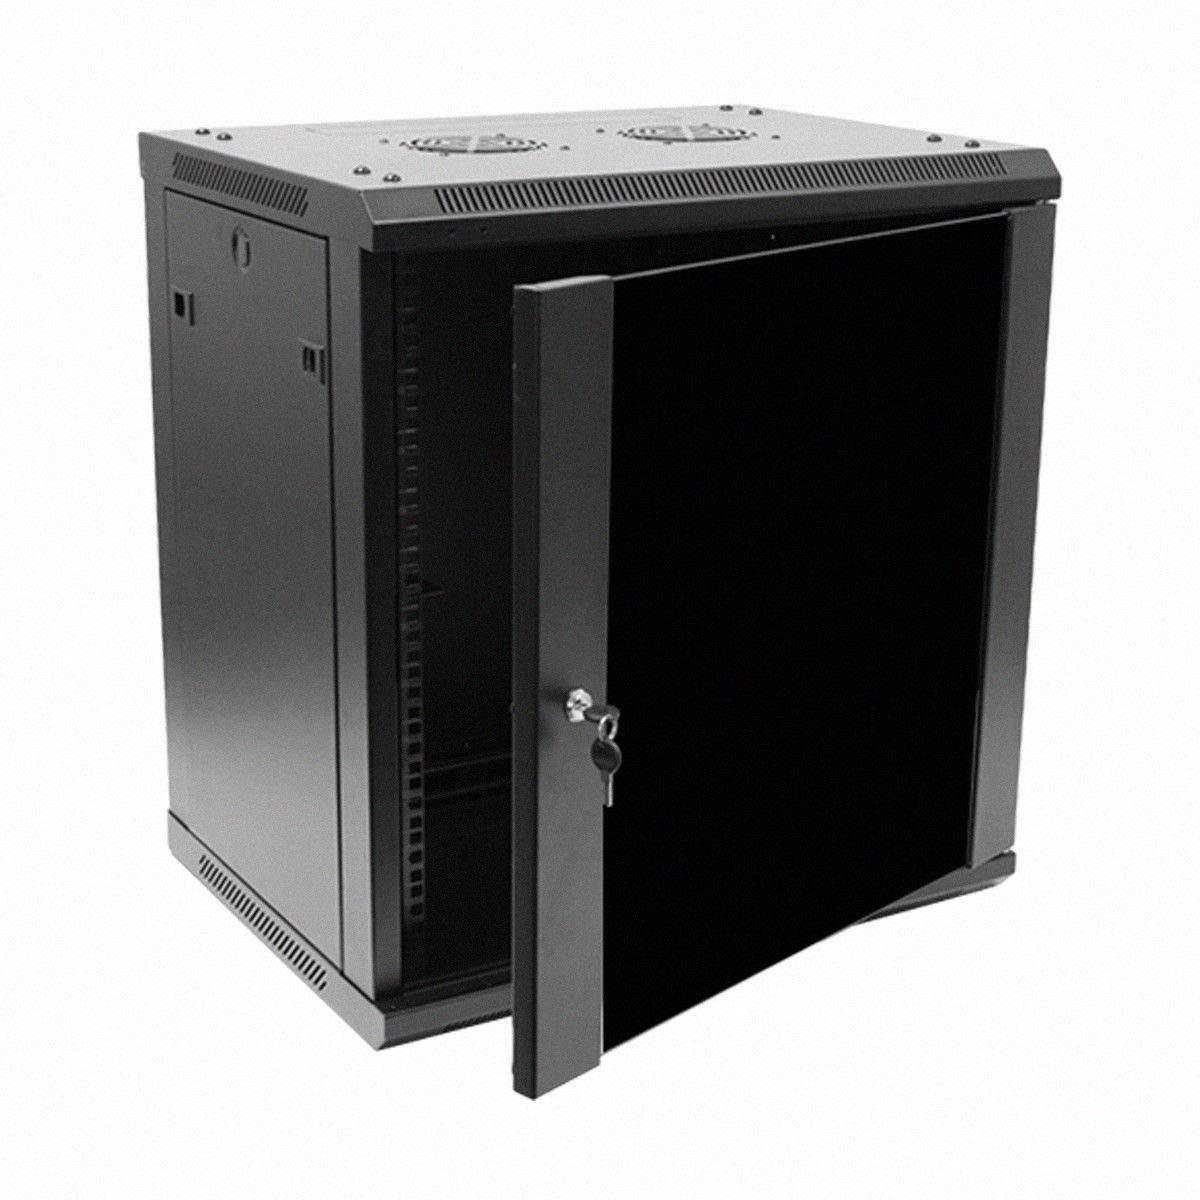 Network Cabinets Network Server Cabinet Rack Enclosure Meshed Door Lock (12U Wall Mount Network) by TECHTONGDA (Image #2)